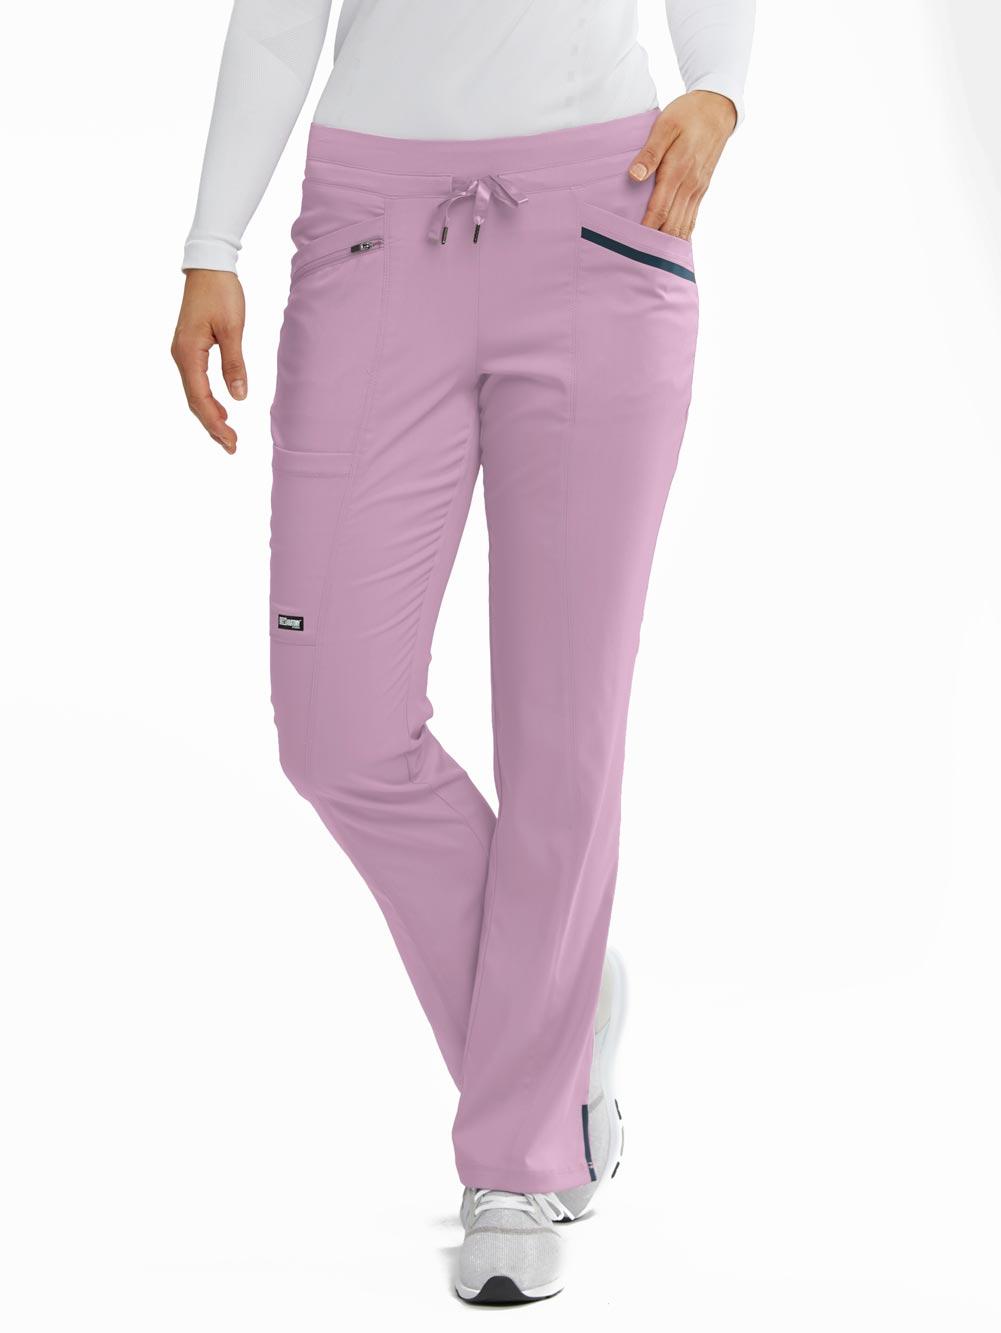 'Melody' 5 Pocket Drawstring Scrub Pants